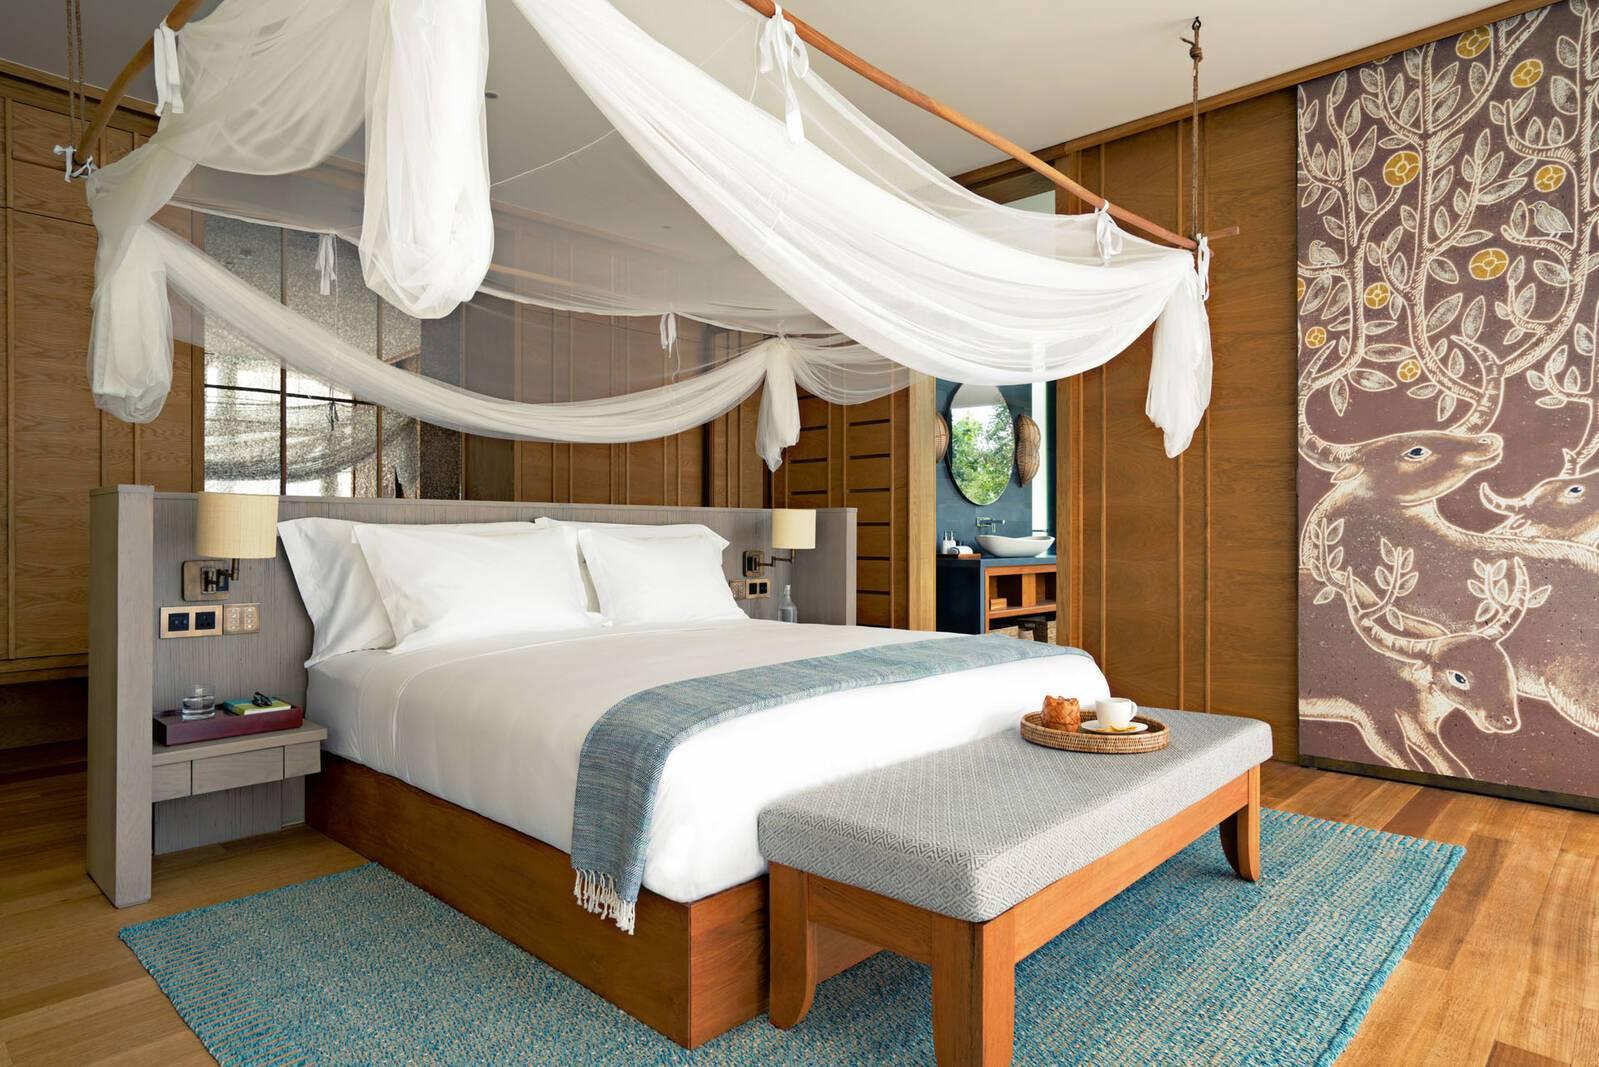 Six Senses Krabey Island Cambodge Ocean Pool Villa Suite bedroom